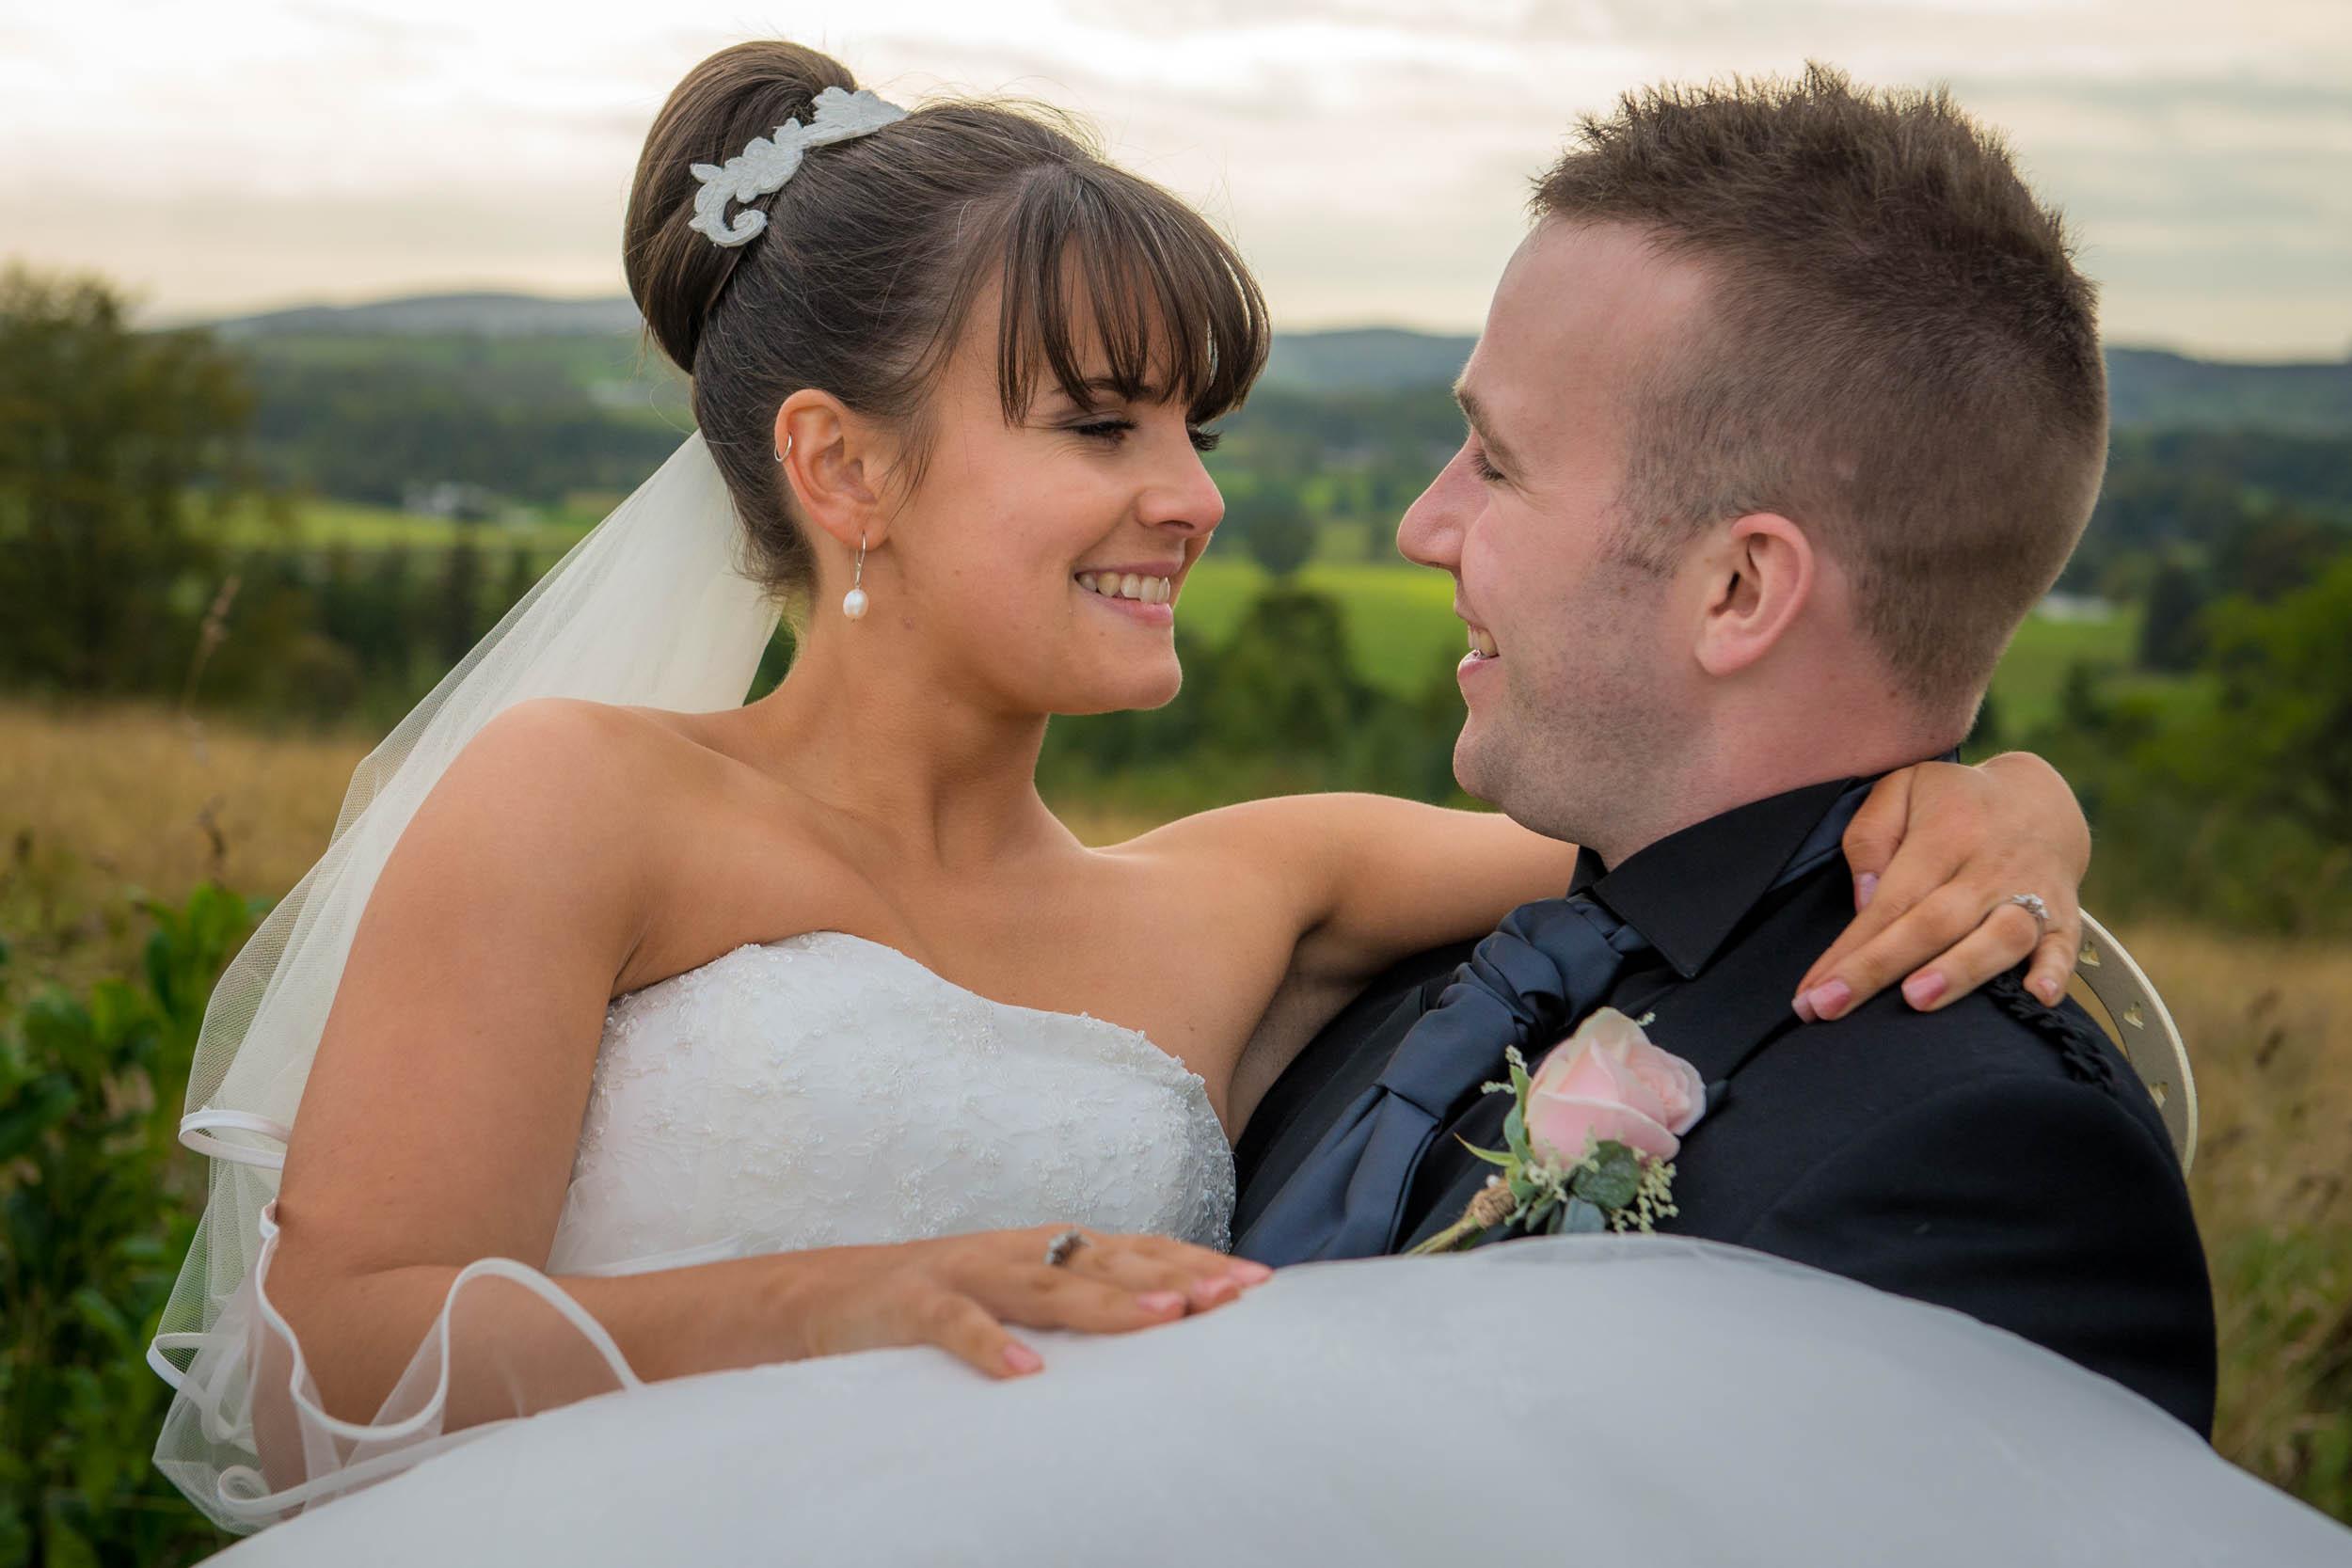 Paul-Saunders-Wedding-Photography-8146.jpg